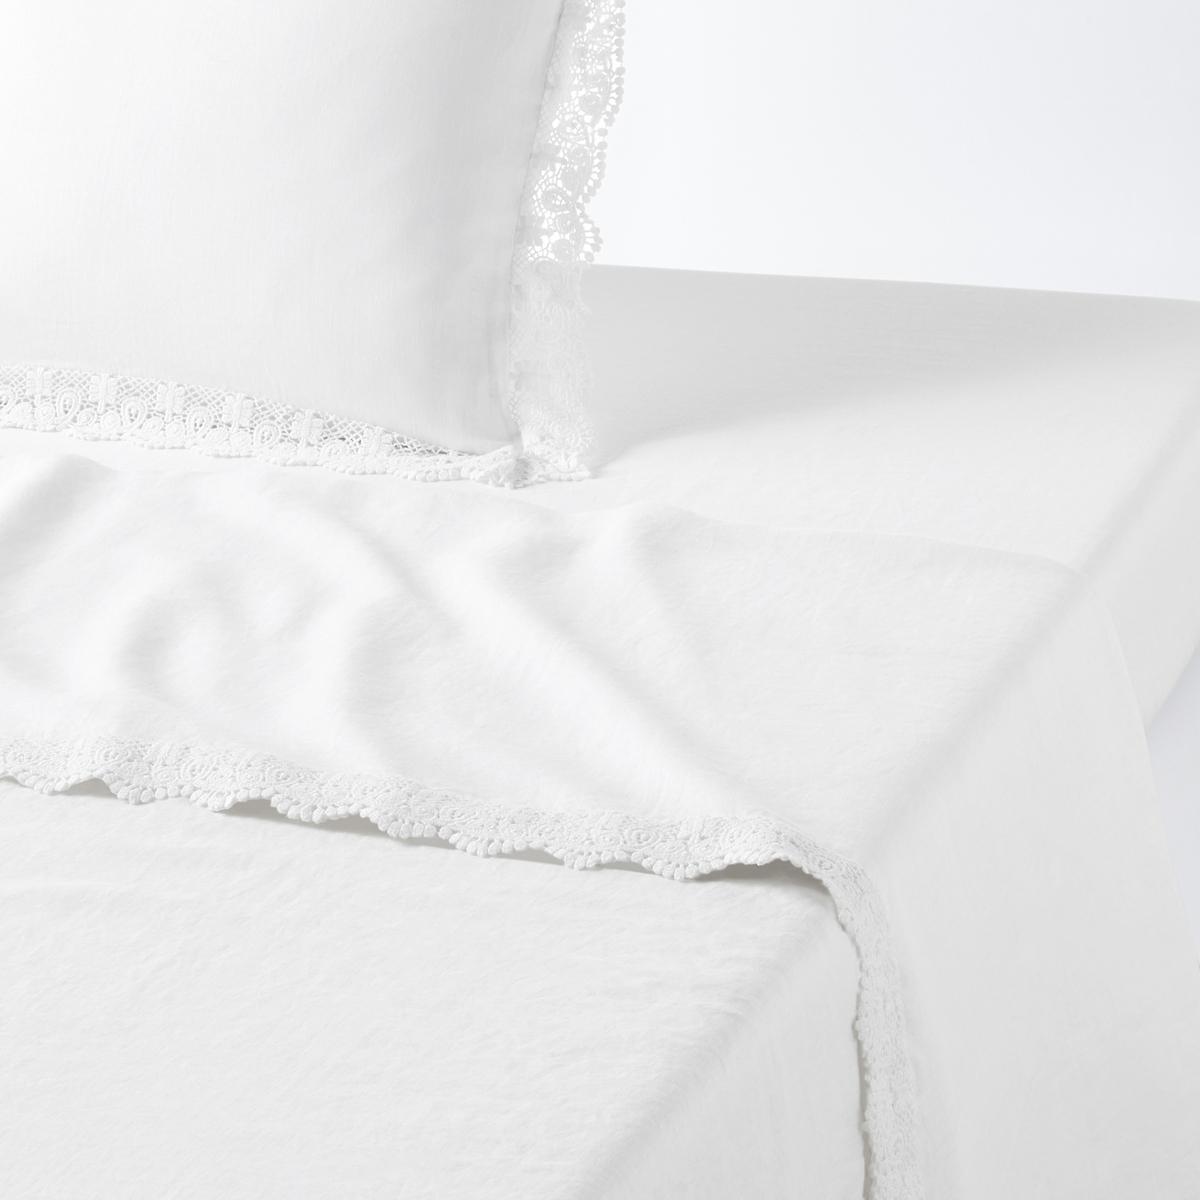 Простыня гладкая star sign decorative thread blanket 130 180 180 220 230 250cm twelve constellations sofa or bed cotton air conditioner blanket